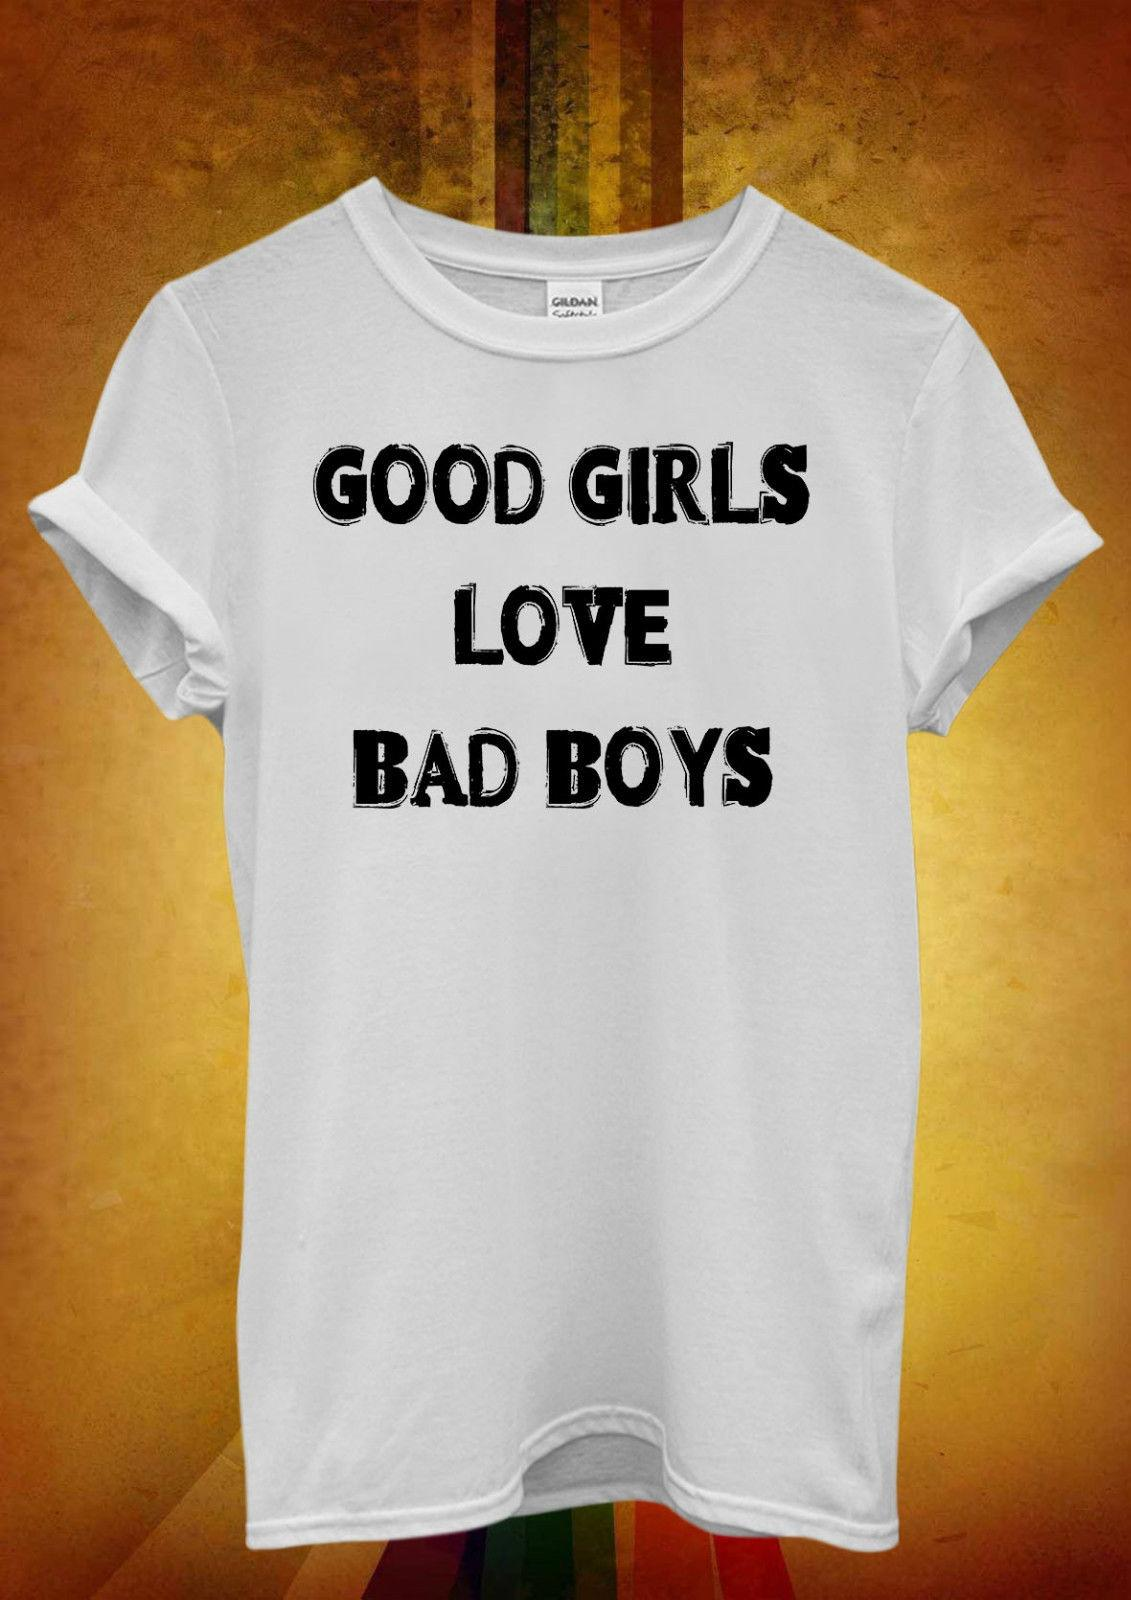 fe297a85 Good Girls Love Bad Boys Cool Funny Men Women Unisex T Shirt Tank Top Vest  865 Cheap Tee Summer Men'S Fashion Tee Online Shopping Tee Shirts Crazy T  Shirts ...